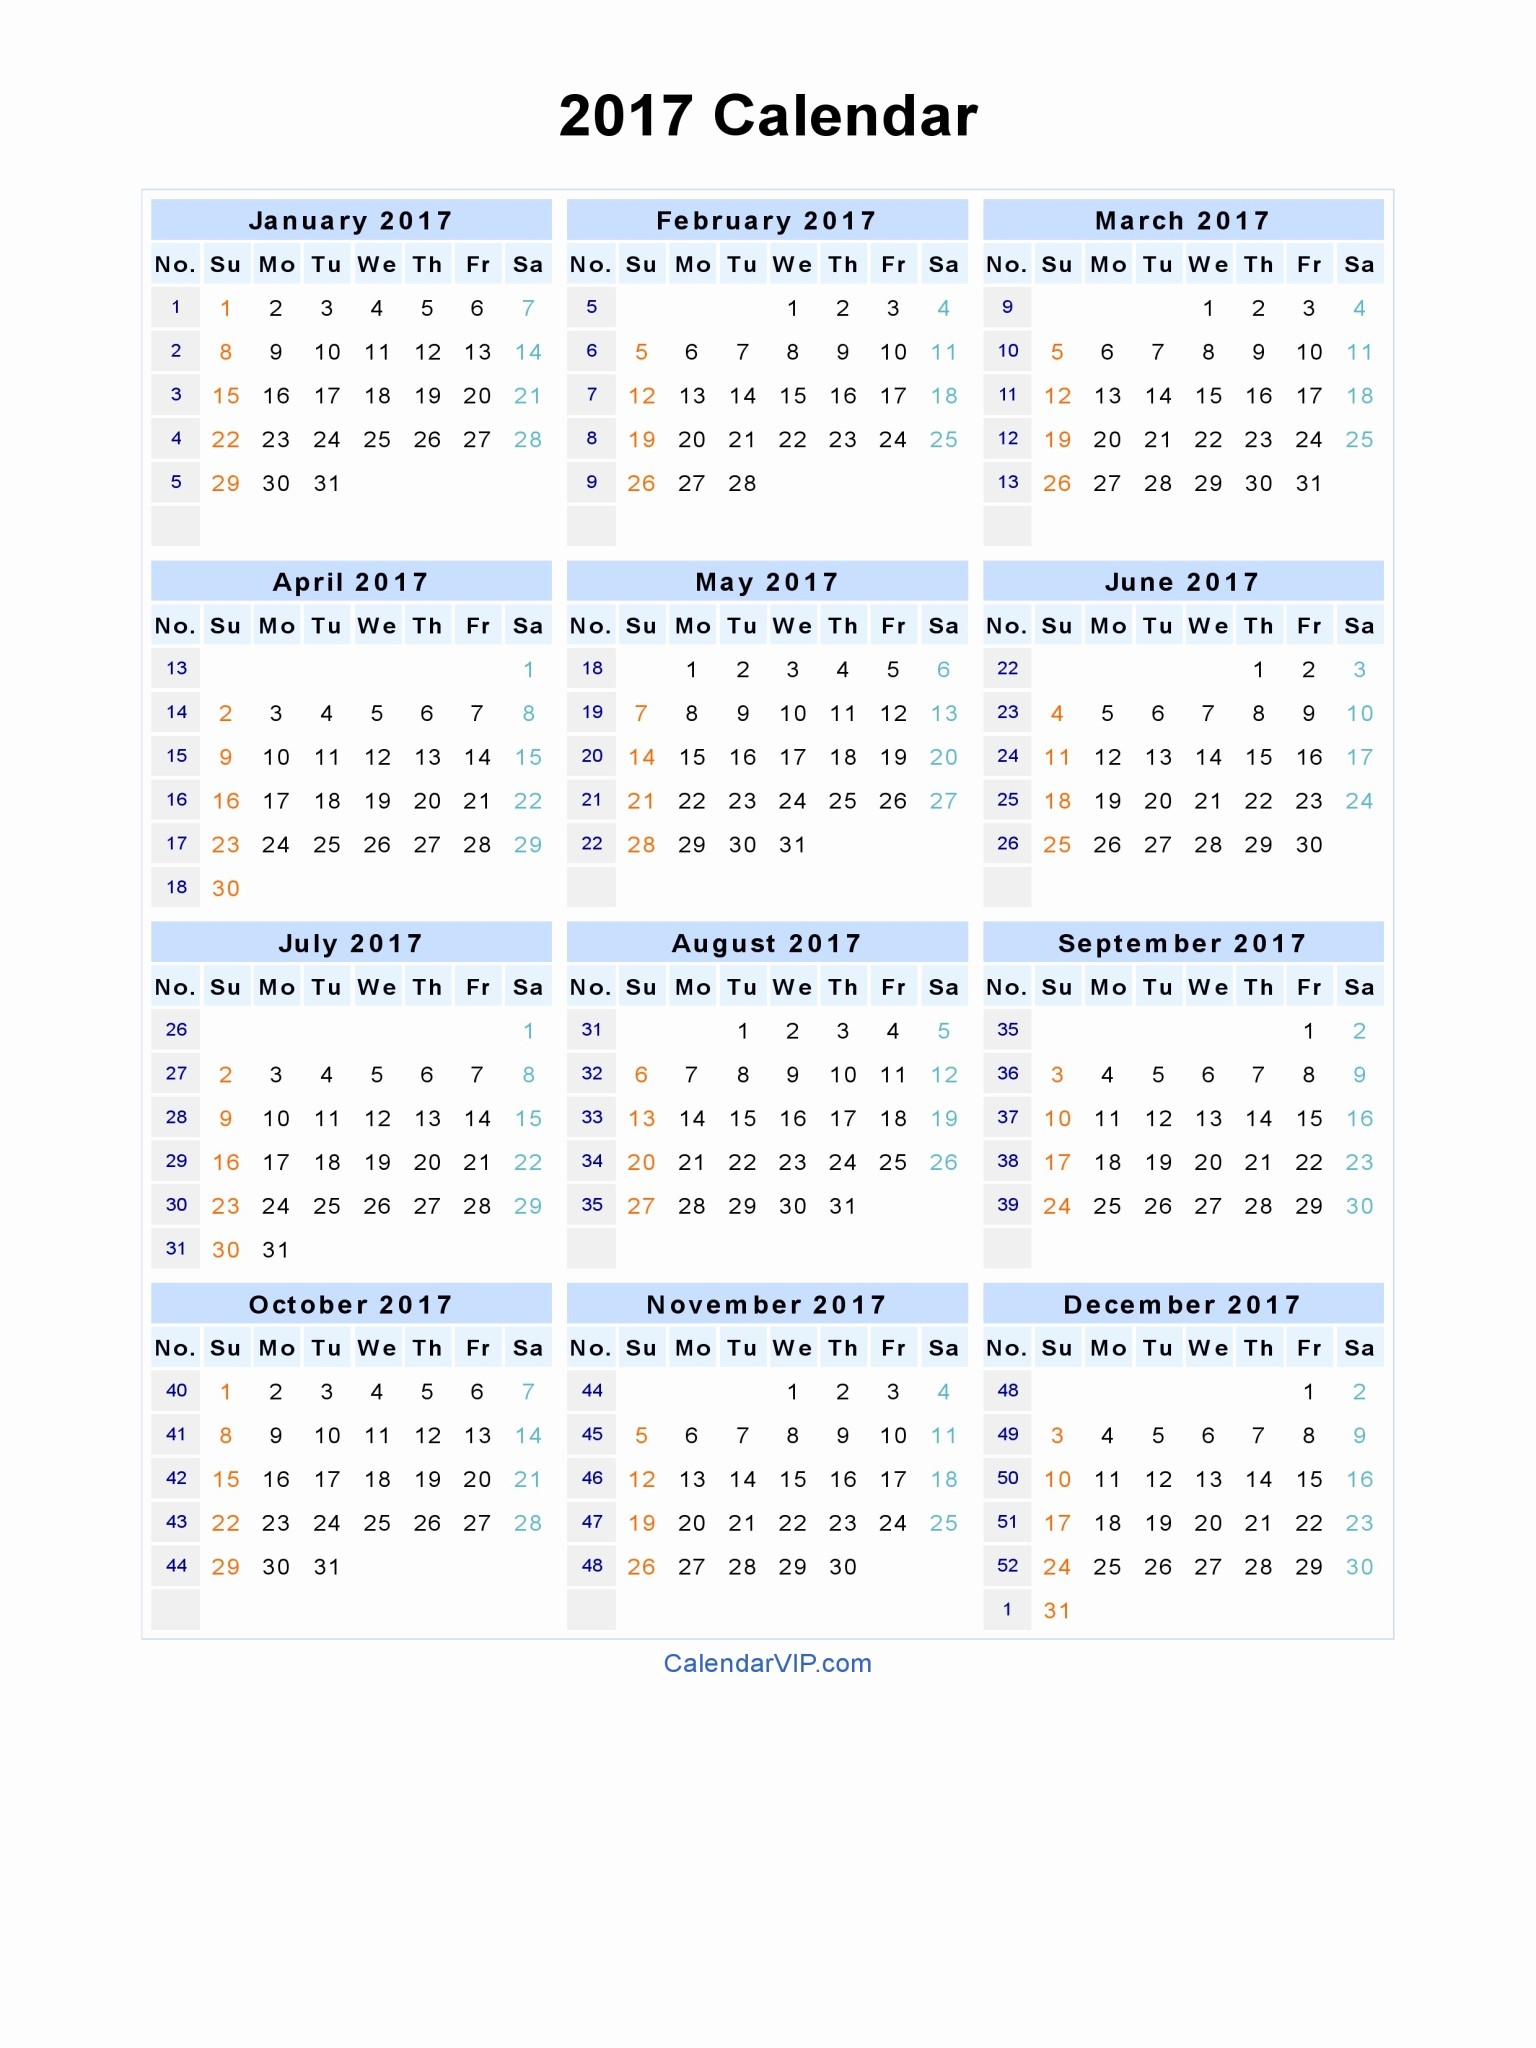 Free 2017 Yearly Calendar Template Inspirational 2017 Printable Calendar Word